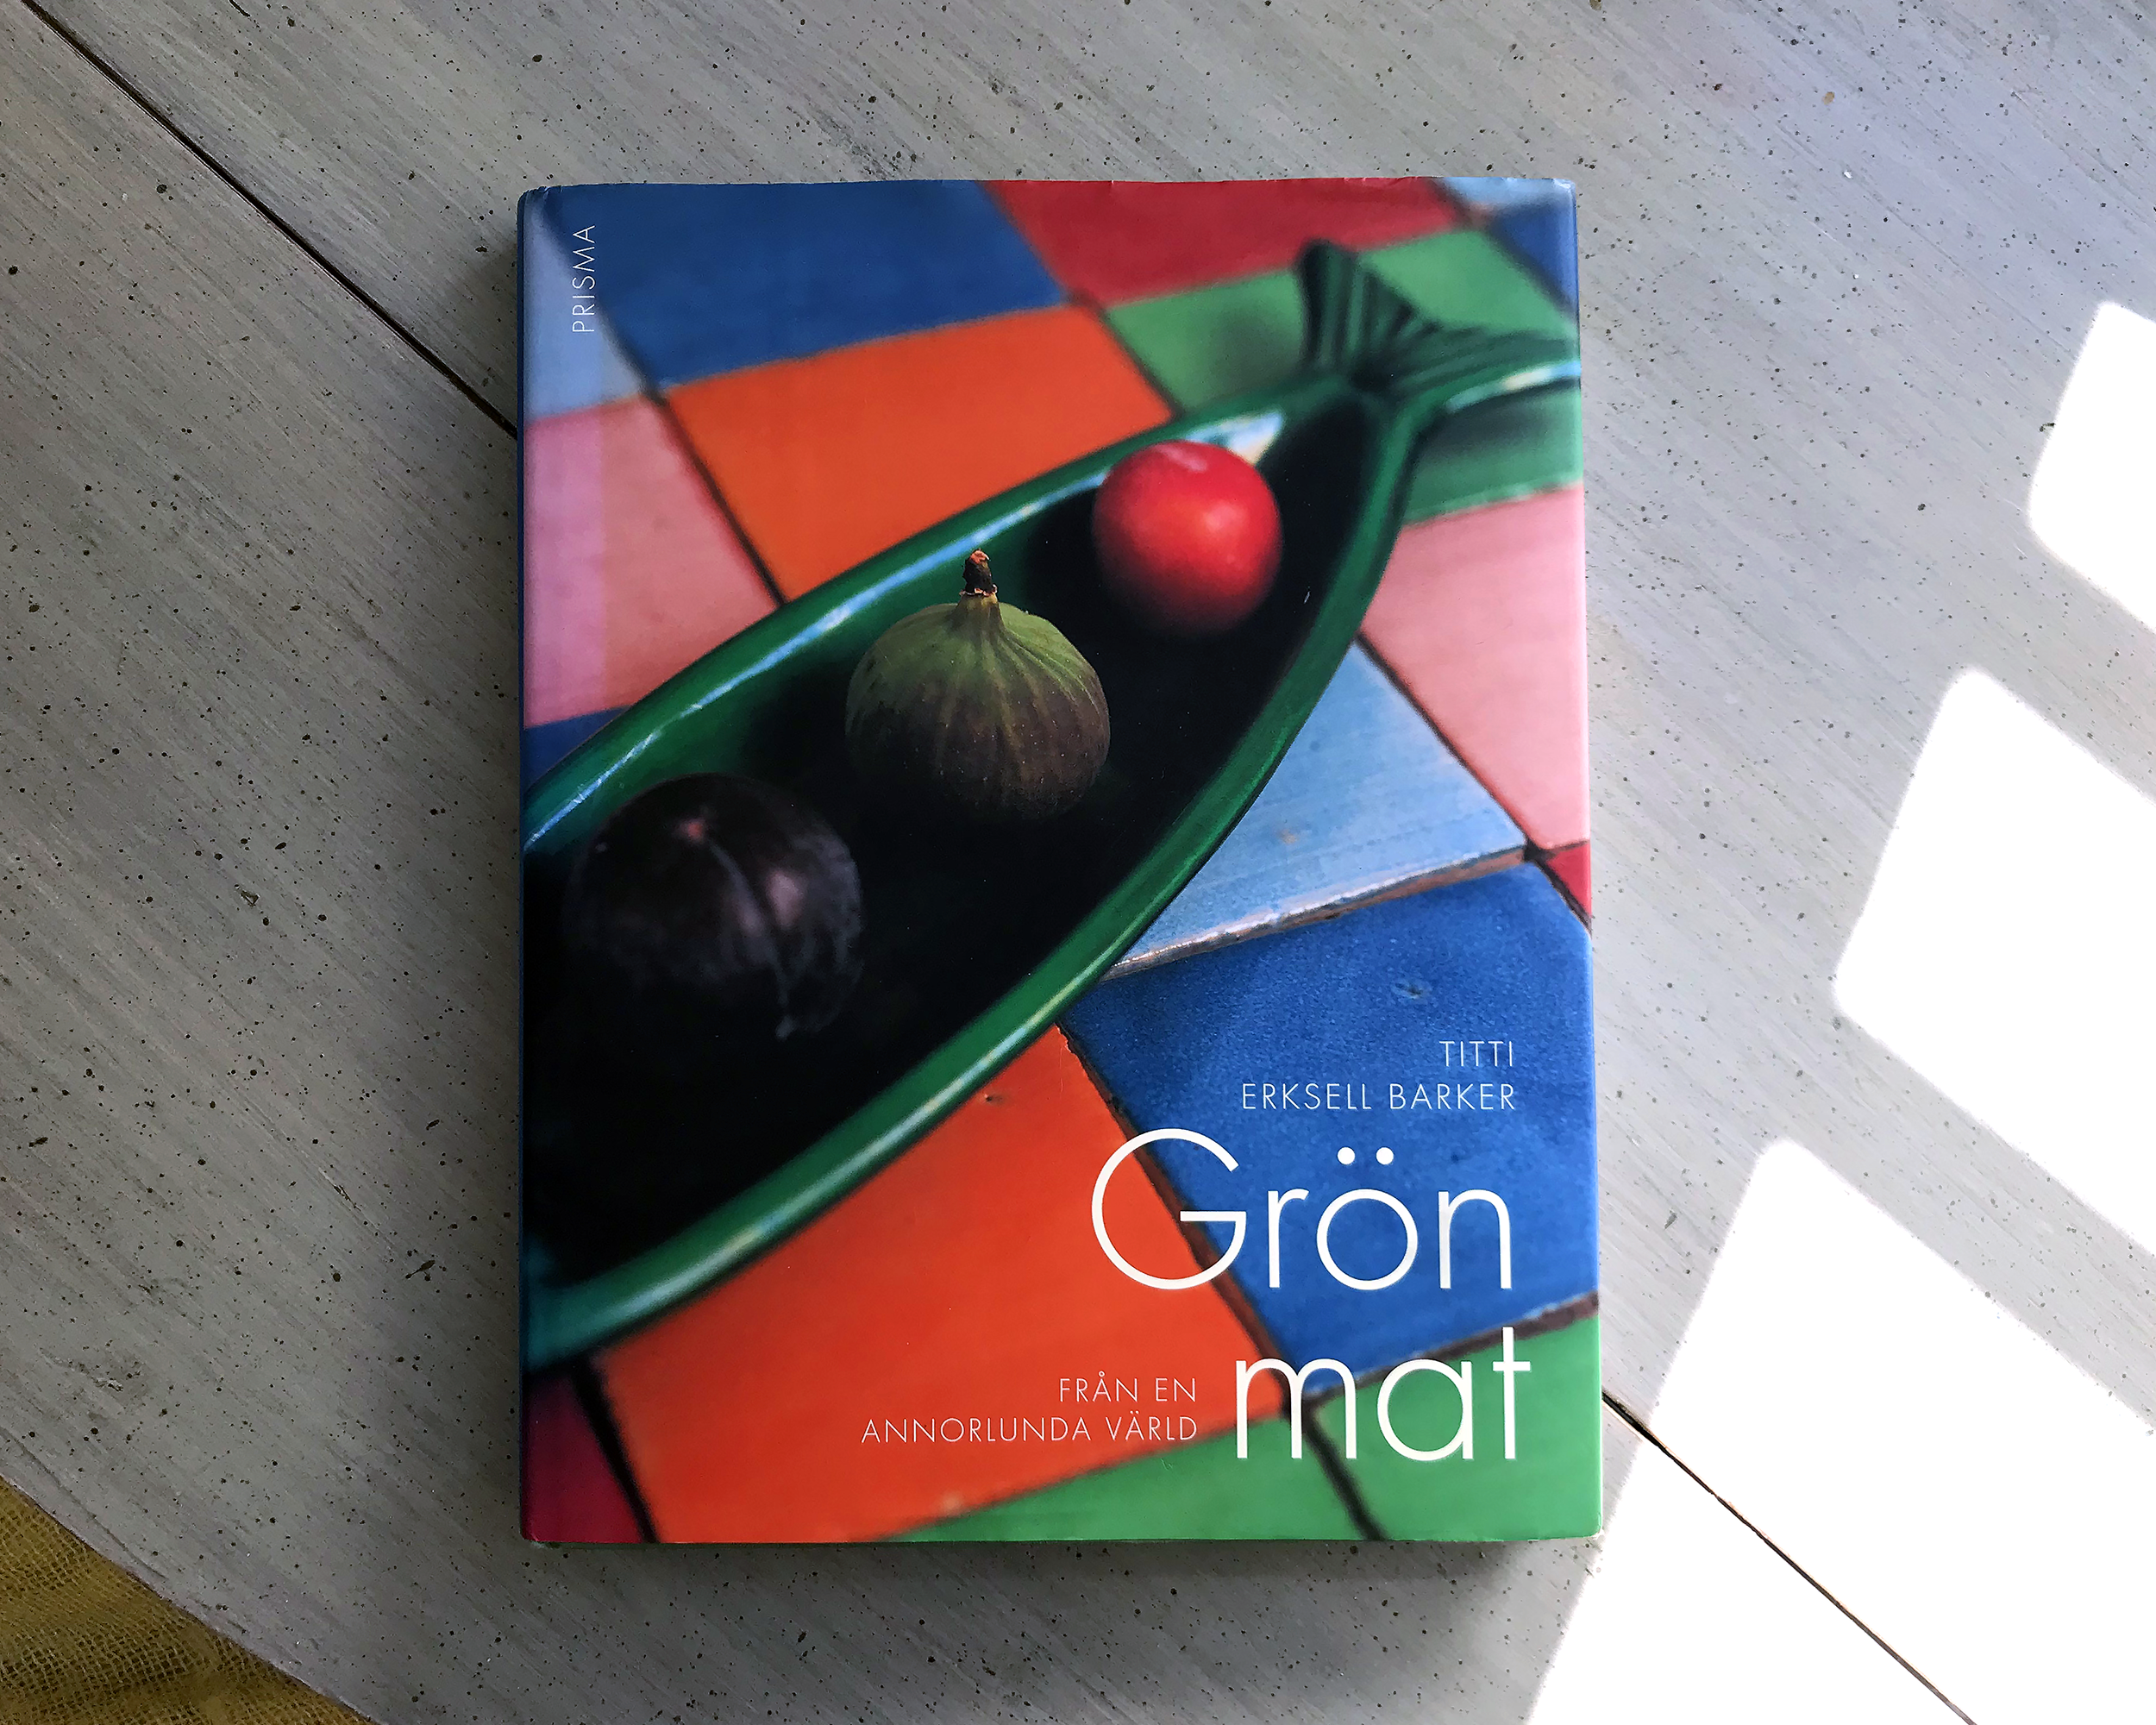 Kokboken Grön mat av Titti Erksell Barker